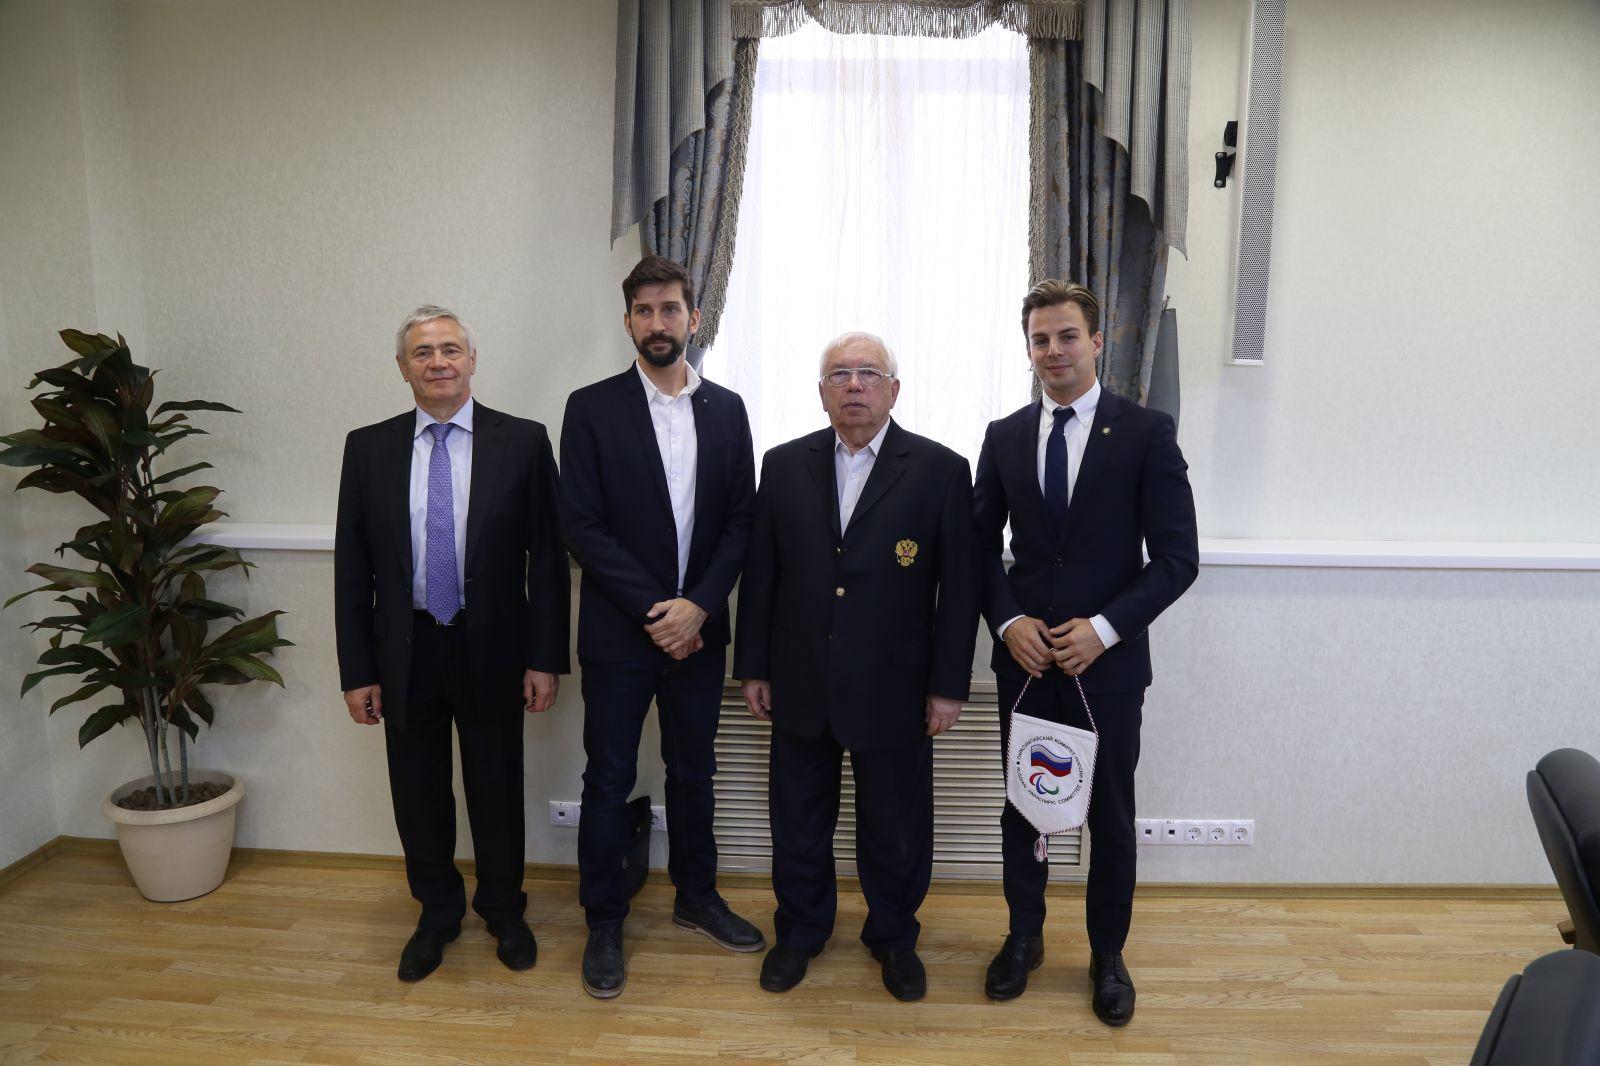 В.П. Лукин, П.А. Рожков в зале Исполкома ПКР встретились с главой отдела международного сотрудничества и коммуникации Международной Федерации Текбола (FITEQ) И. Добреи